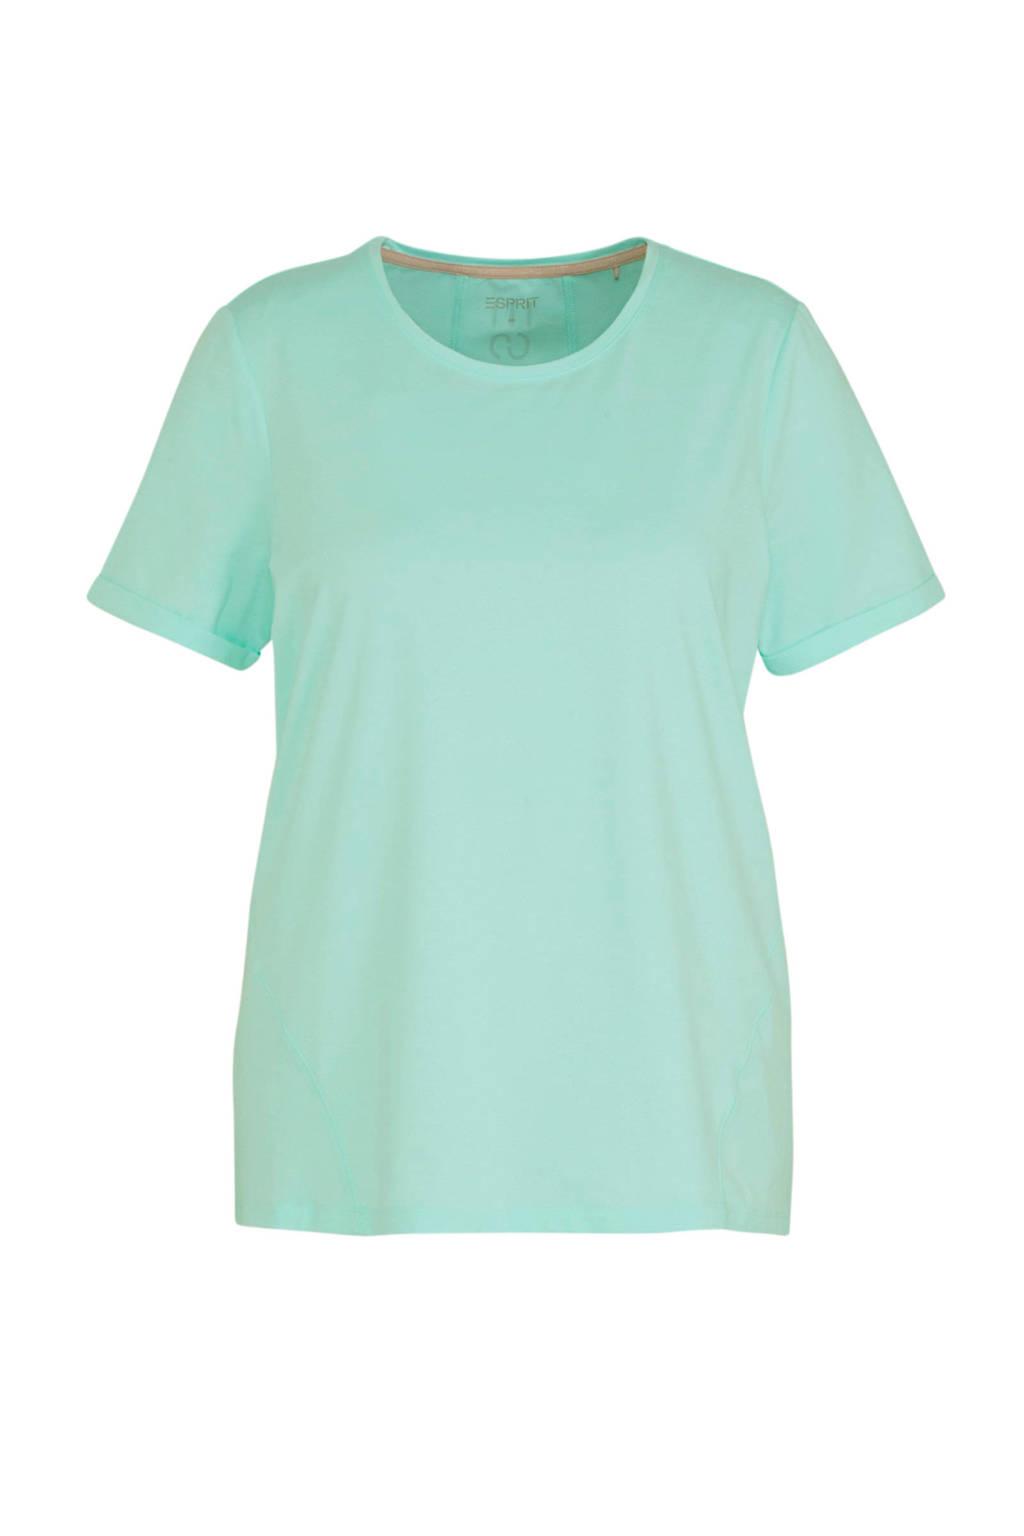 ESPRIT Women Sports Plus Size T-shirt mintgroen, Mintgroen